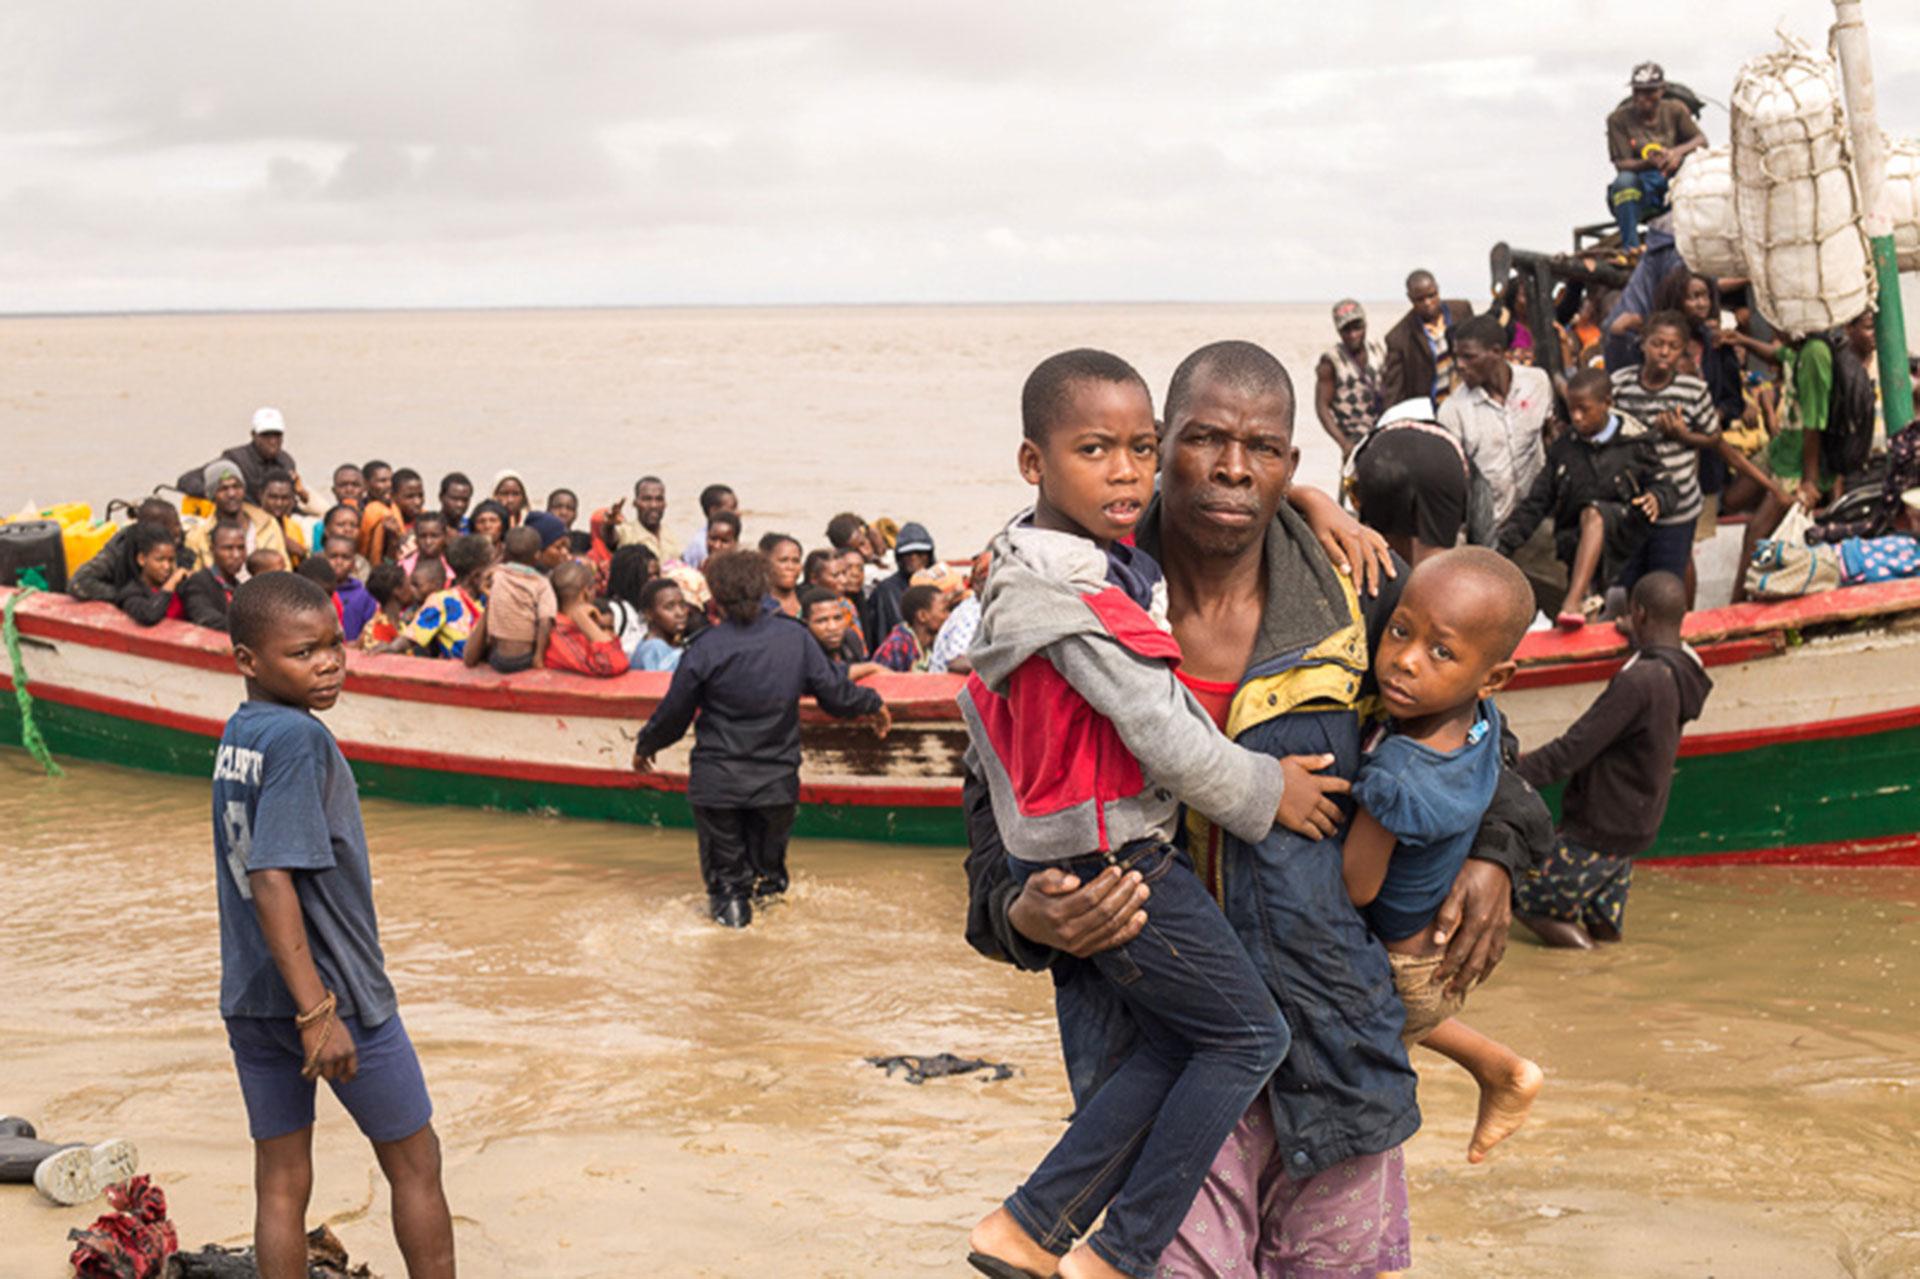 Sobrevivientes del ciclón Idaillegan al centro de Beira tras ser evacuados de sus hogares(Foto: Denis Onyodi/Red Cross Red Crescent Climate Centre/Handout via REUTERS)